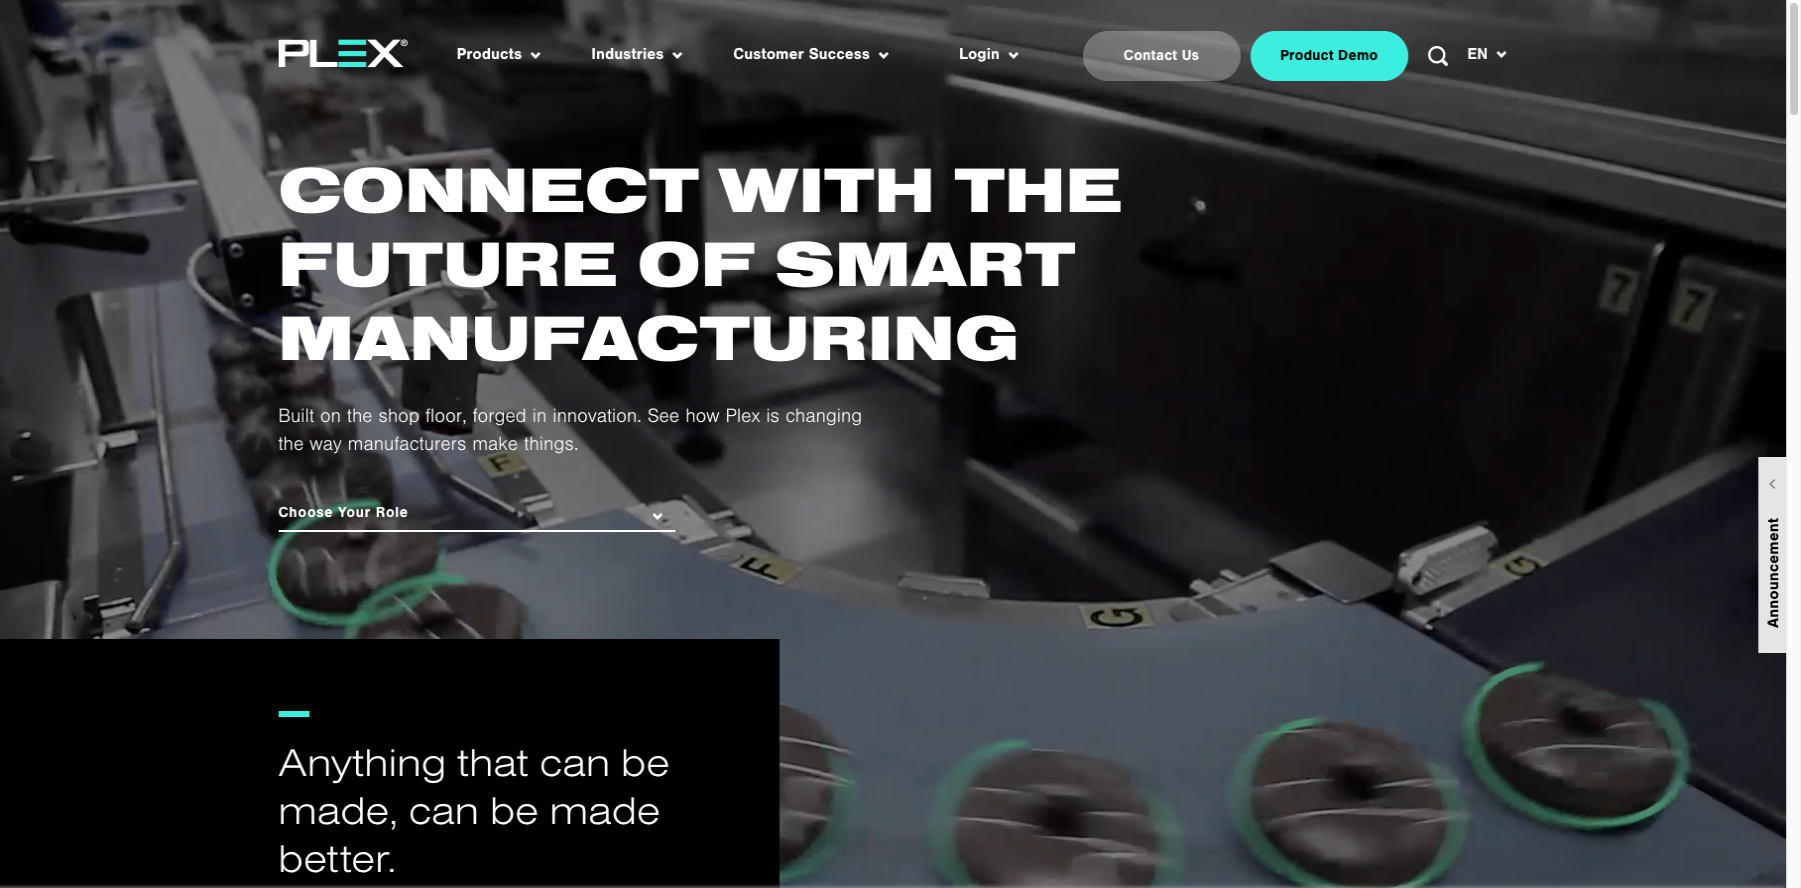 Industrial Website Design Example - The-Smart-Manufacturing-Platform-Plex